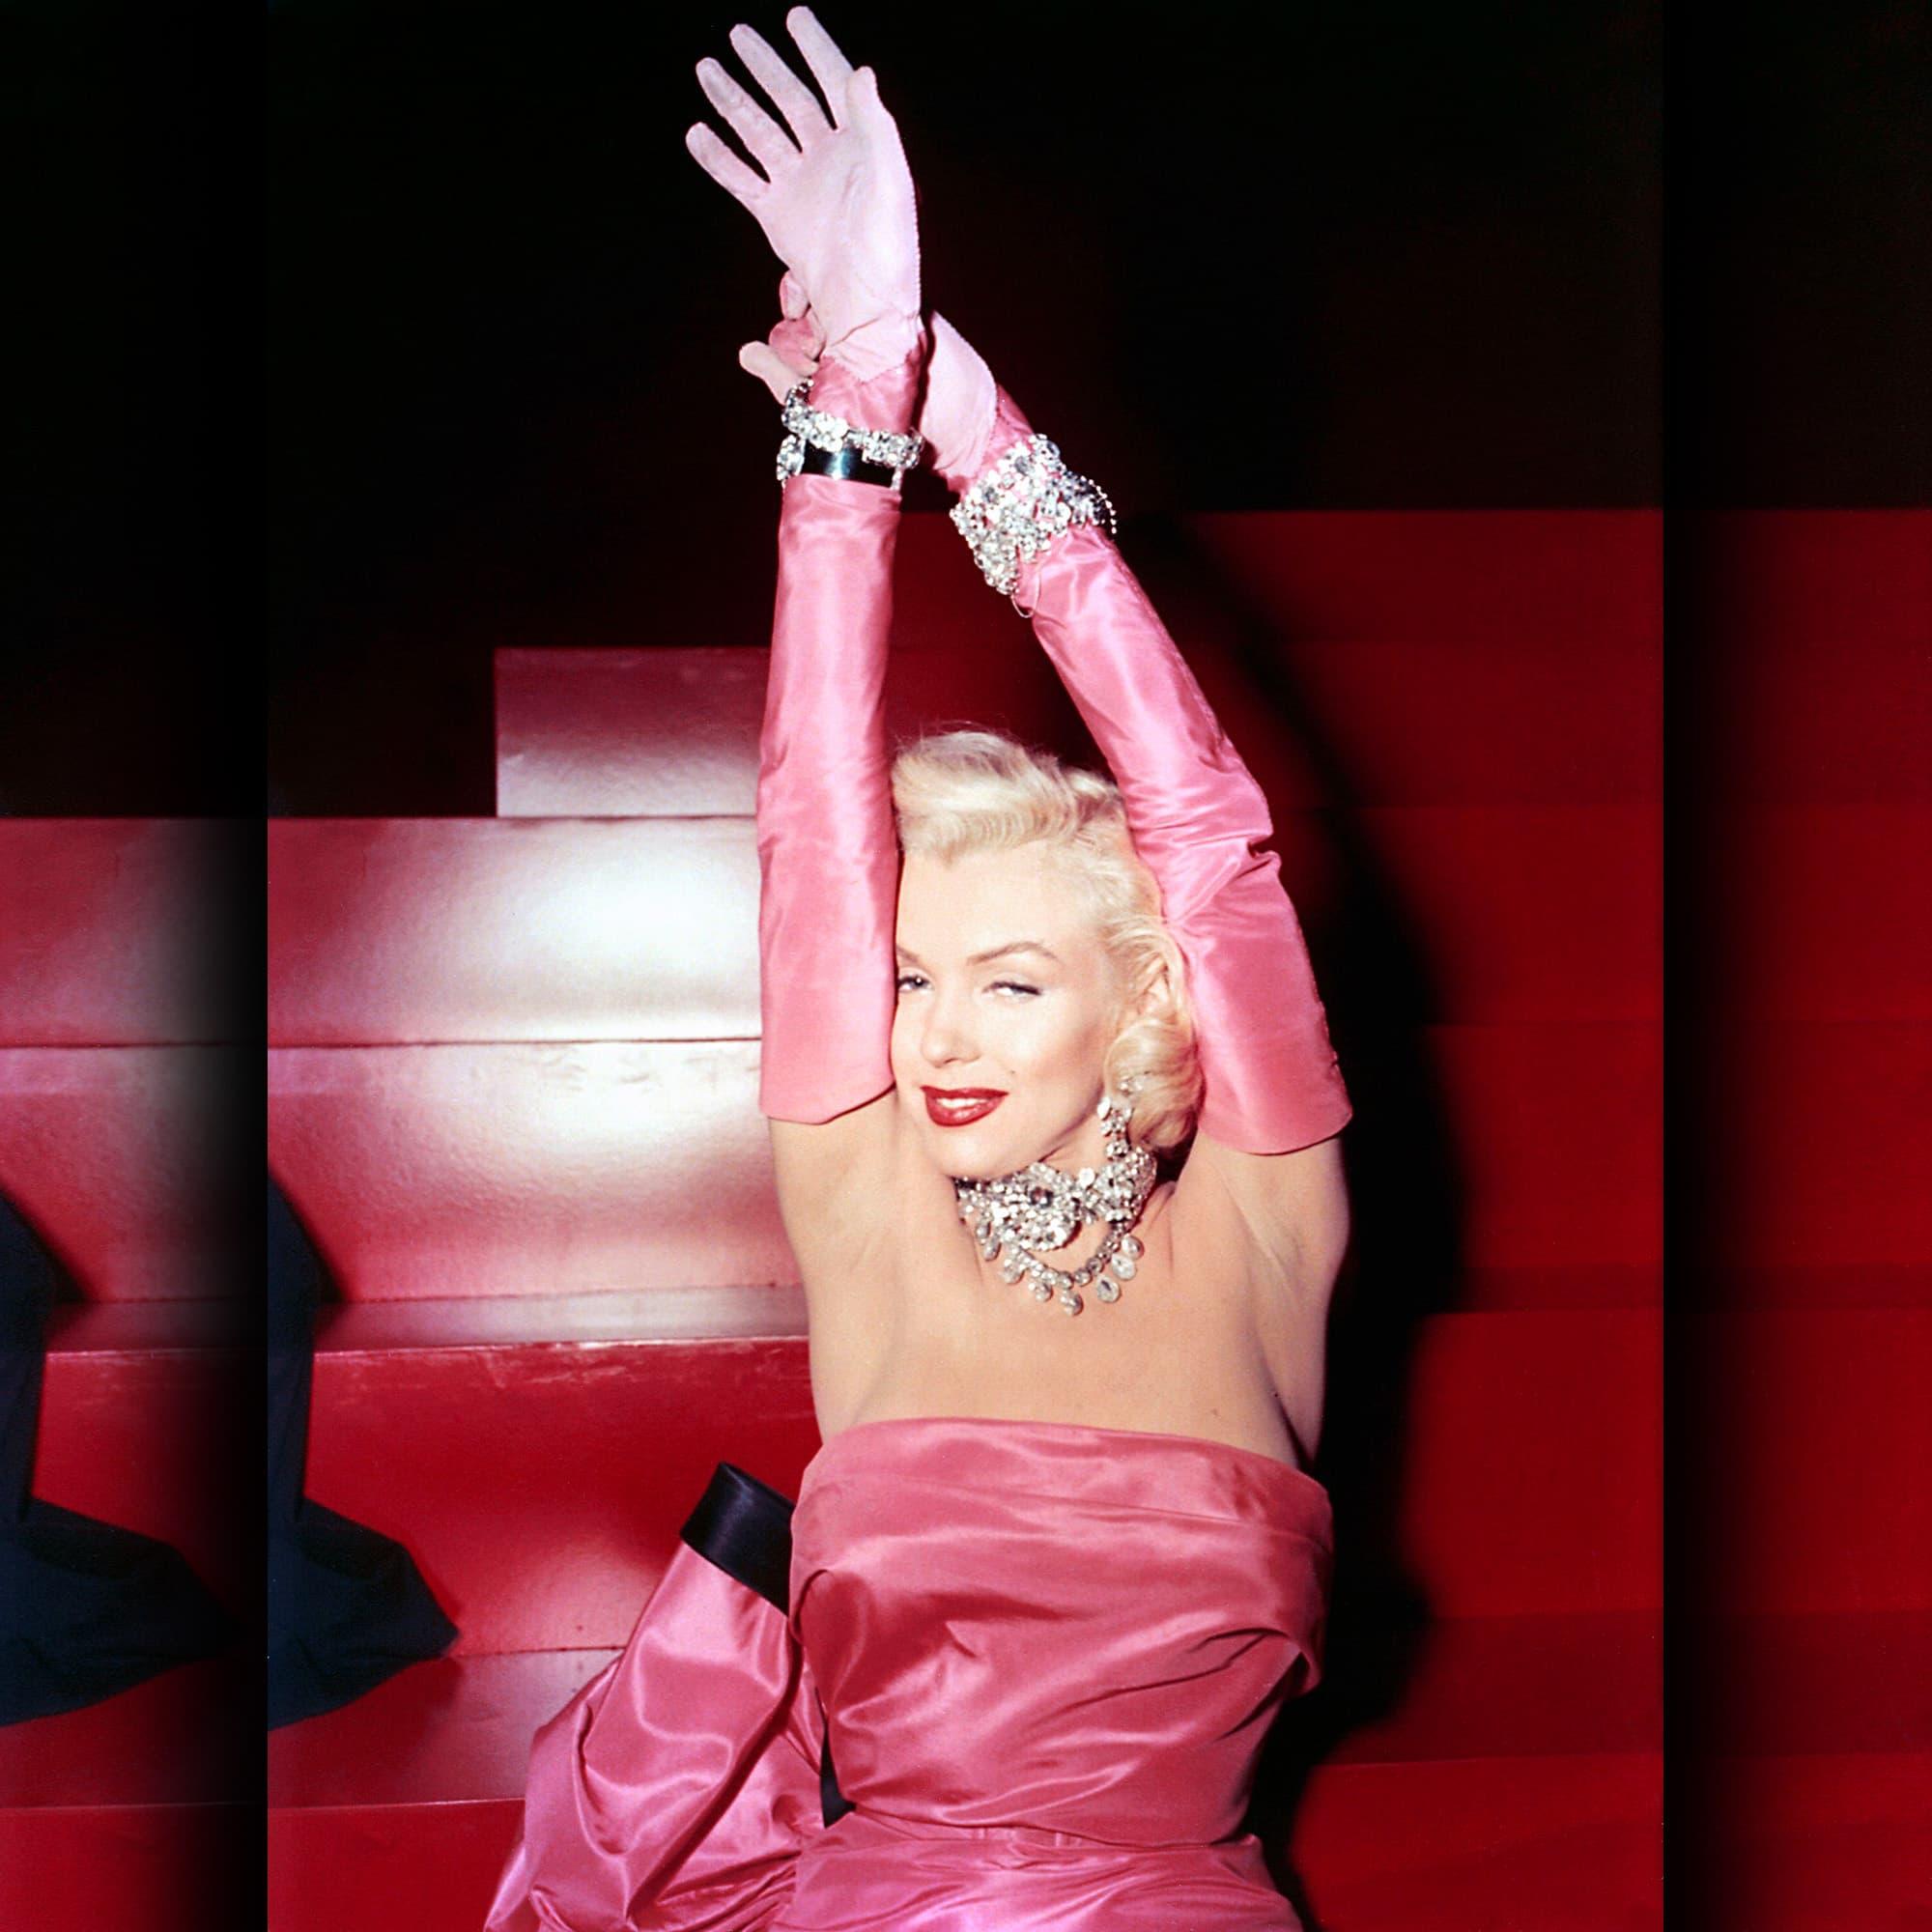 Marilyn Monroe in her Shocking Pink tight dress - movie Gentlemen Prefer Blondes